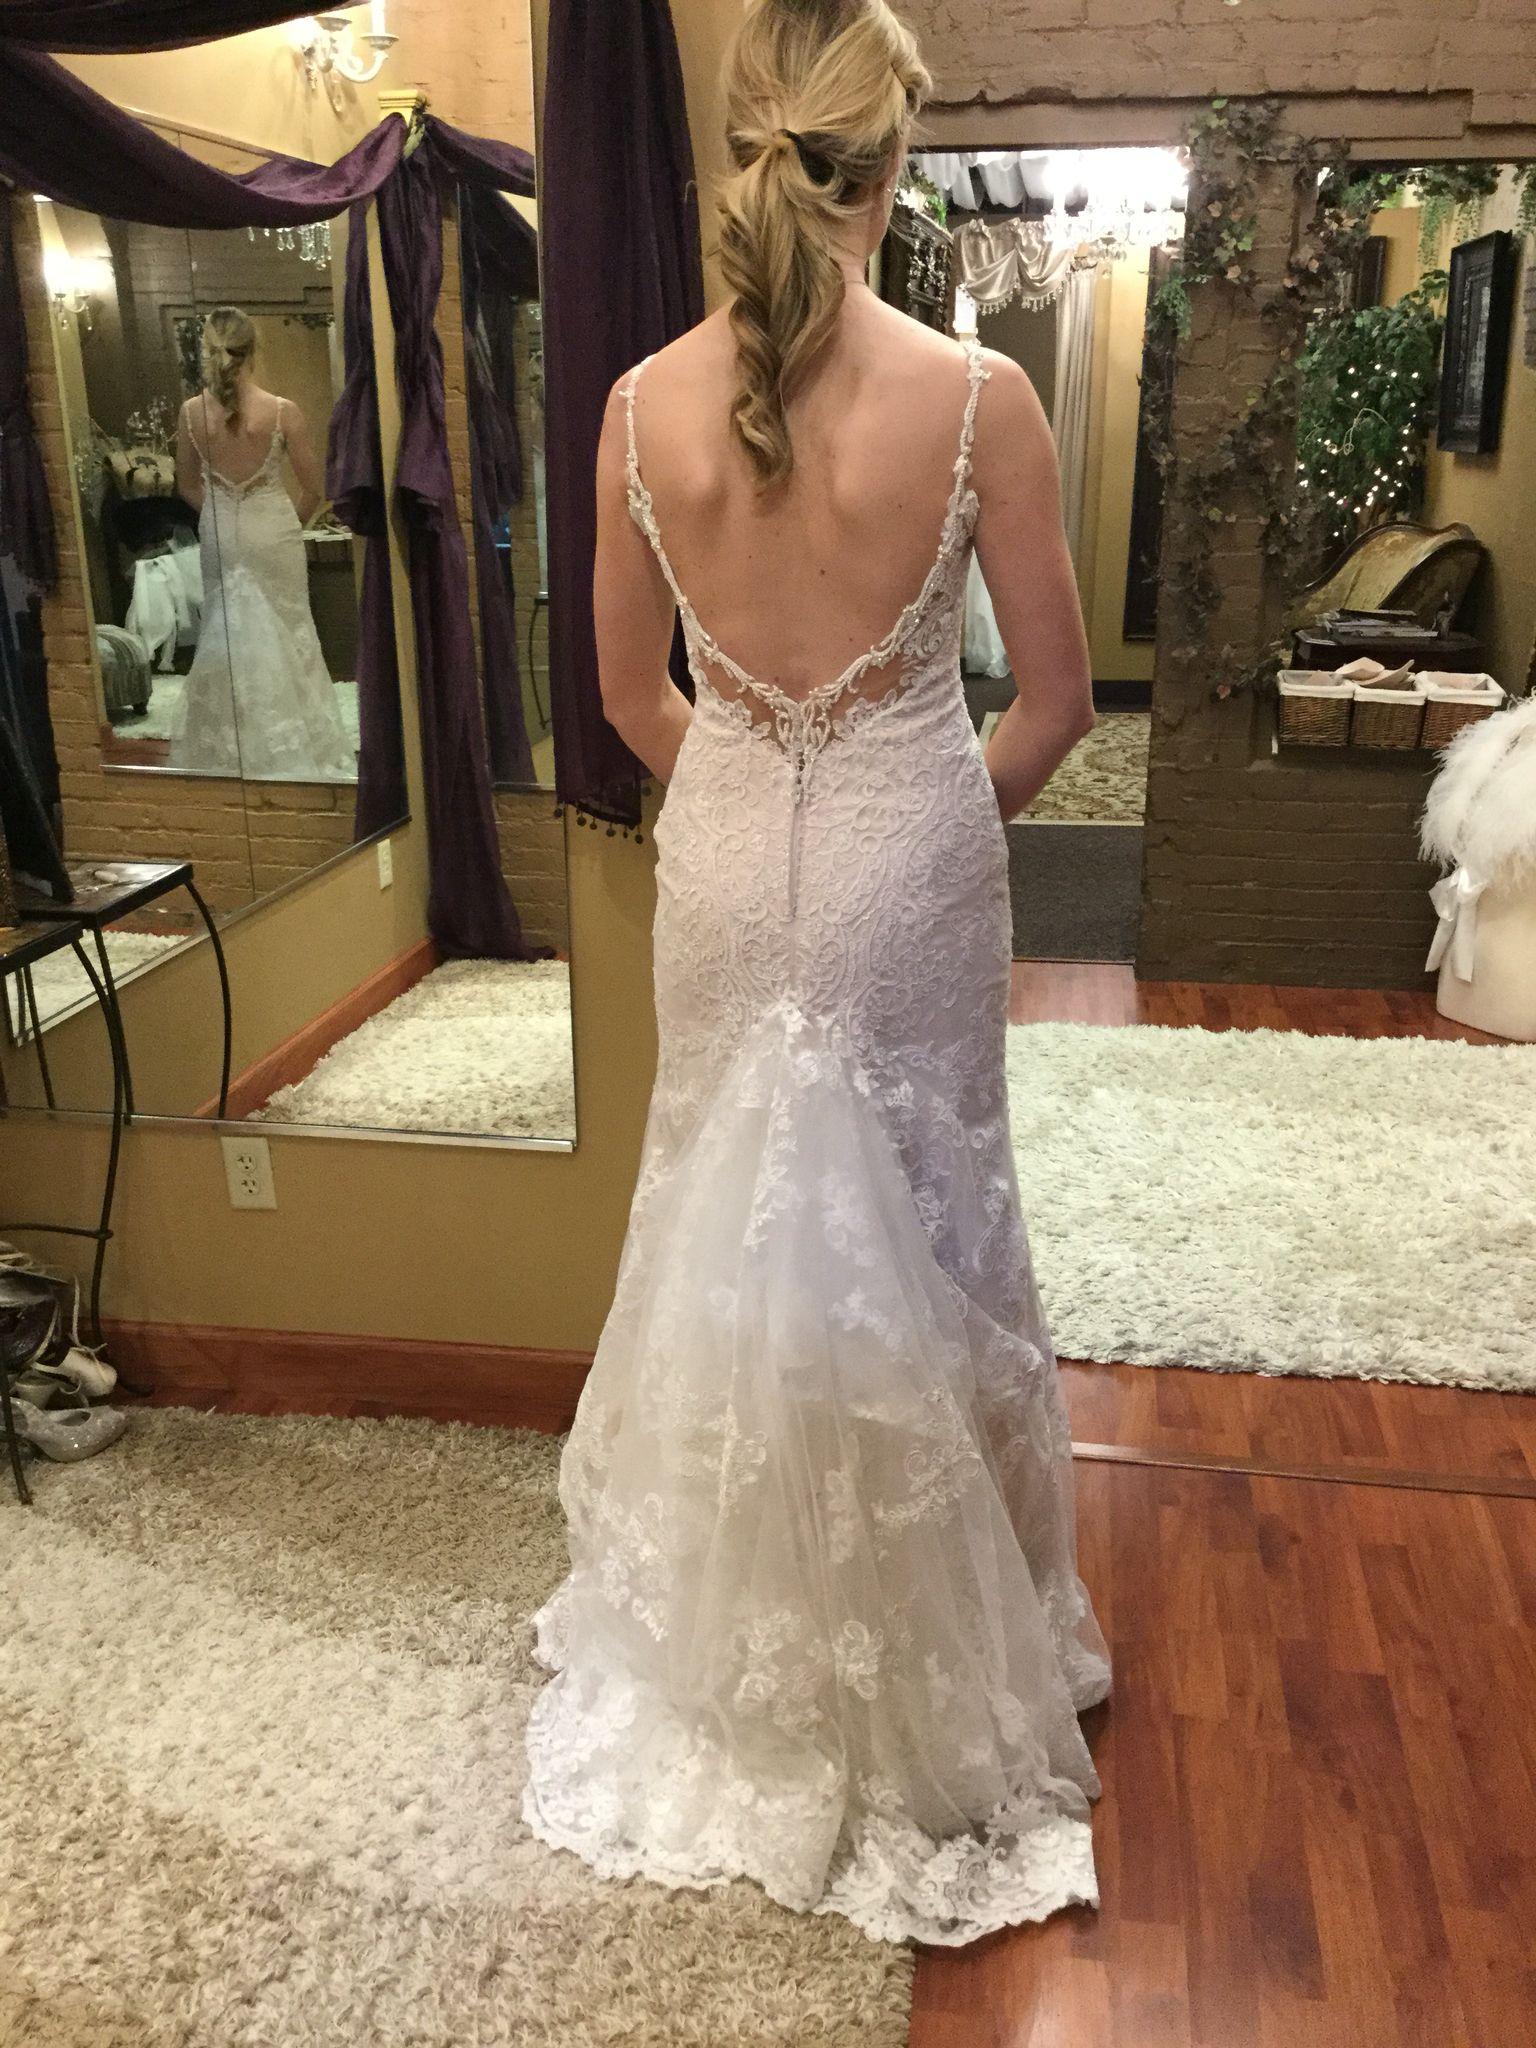 Split layer American bustle | Wedding Gown Bustle Styles